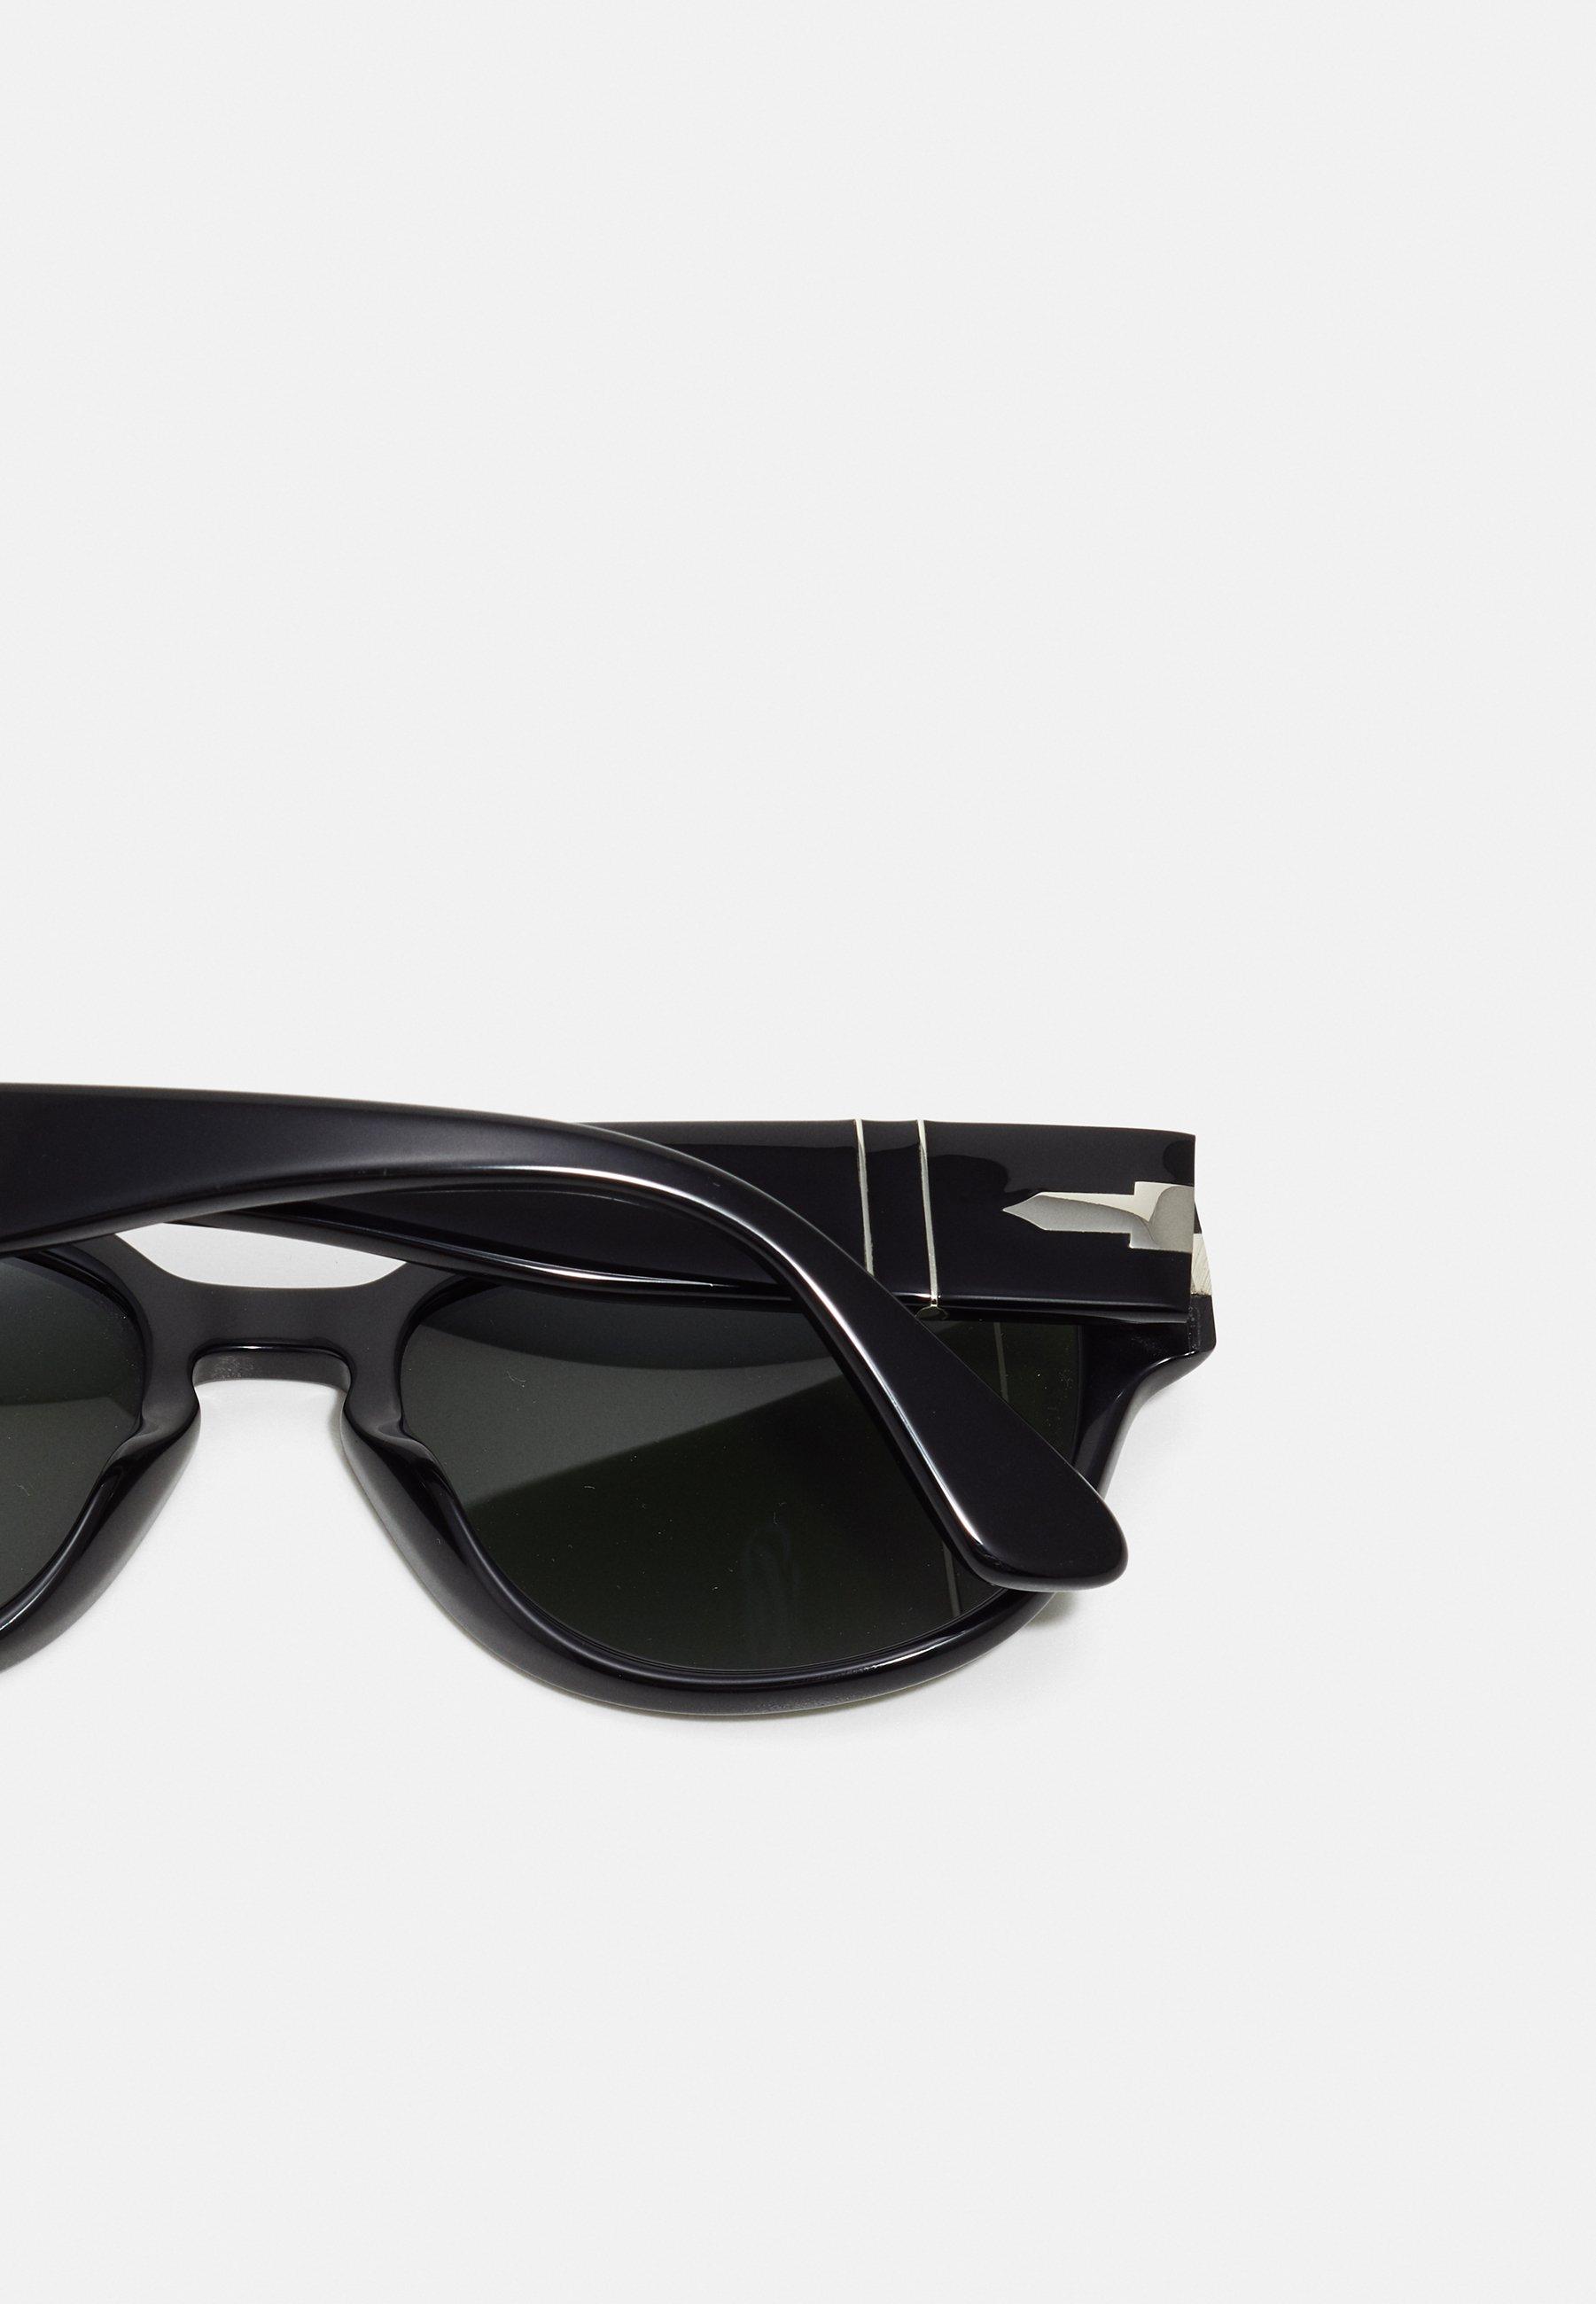 Persol Solbriller - black/svart C7BvTXWSgEDiudV